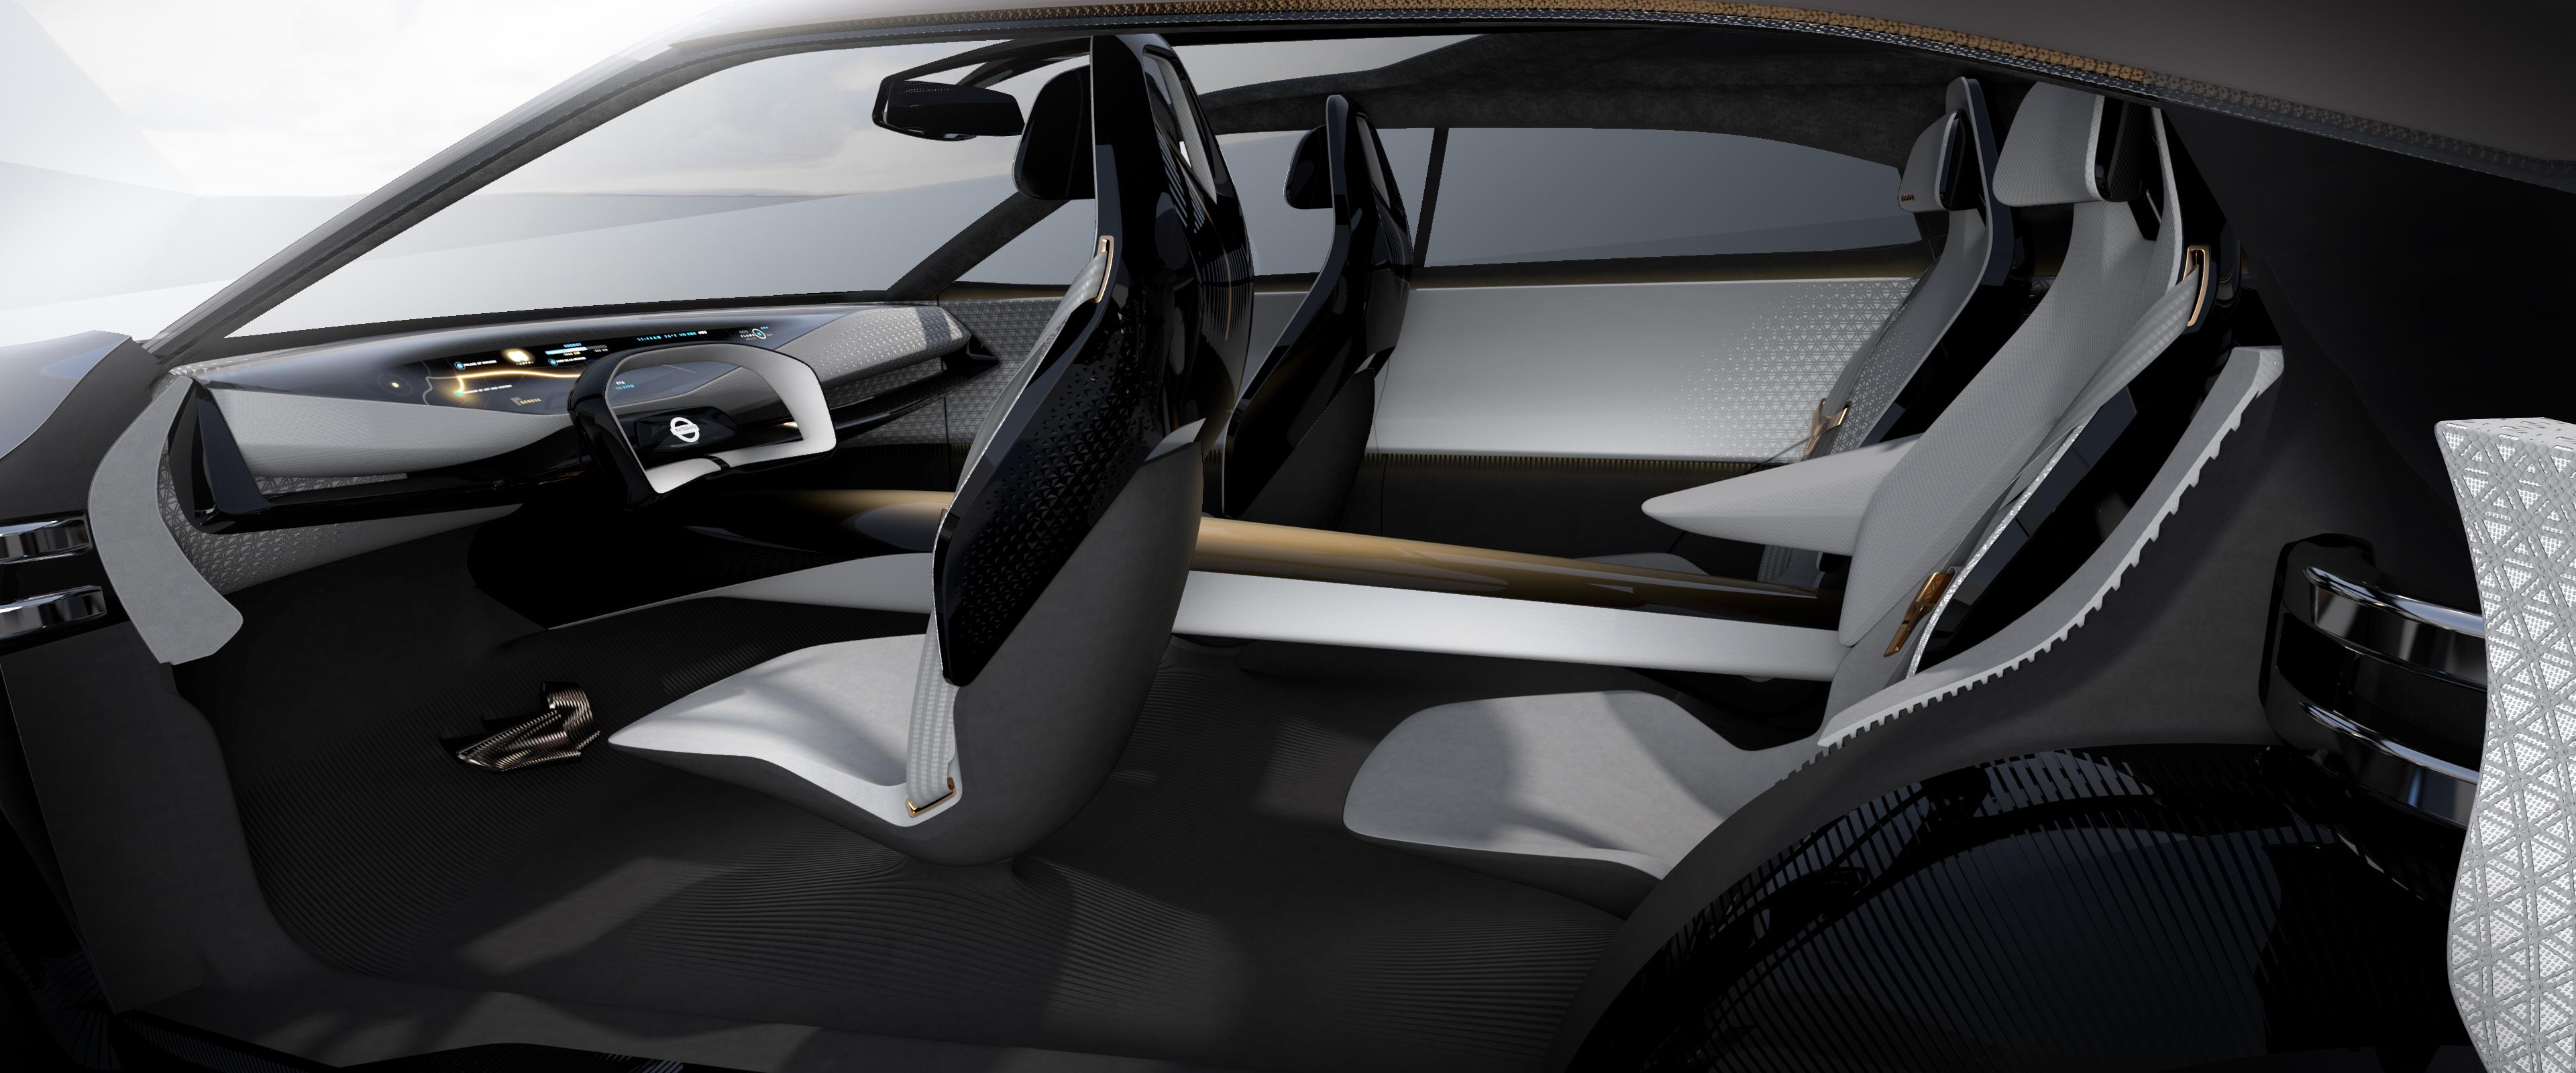 IMQ Concept car Interior 14-source